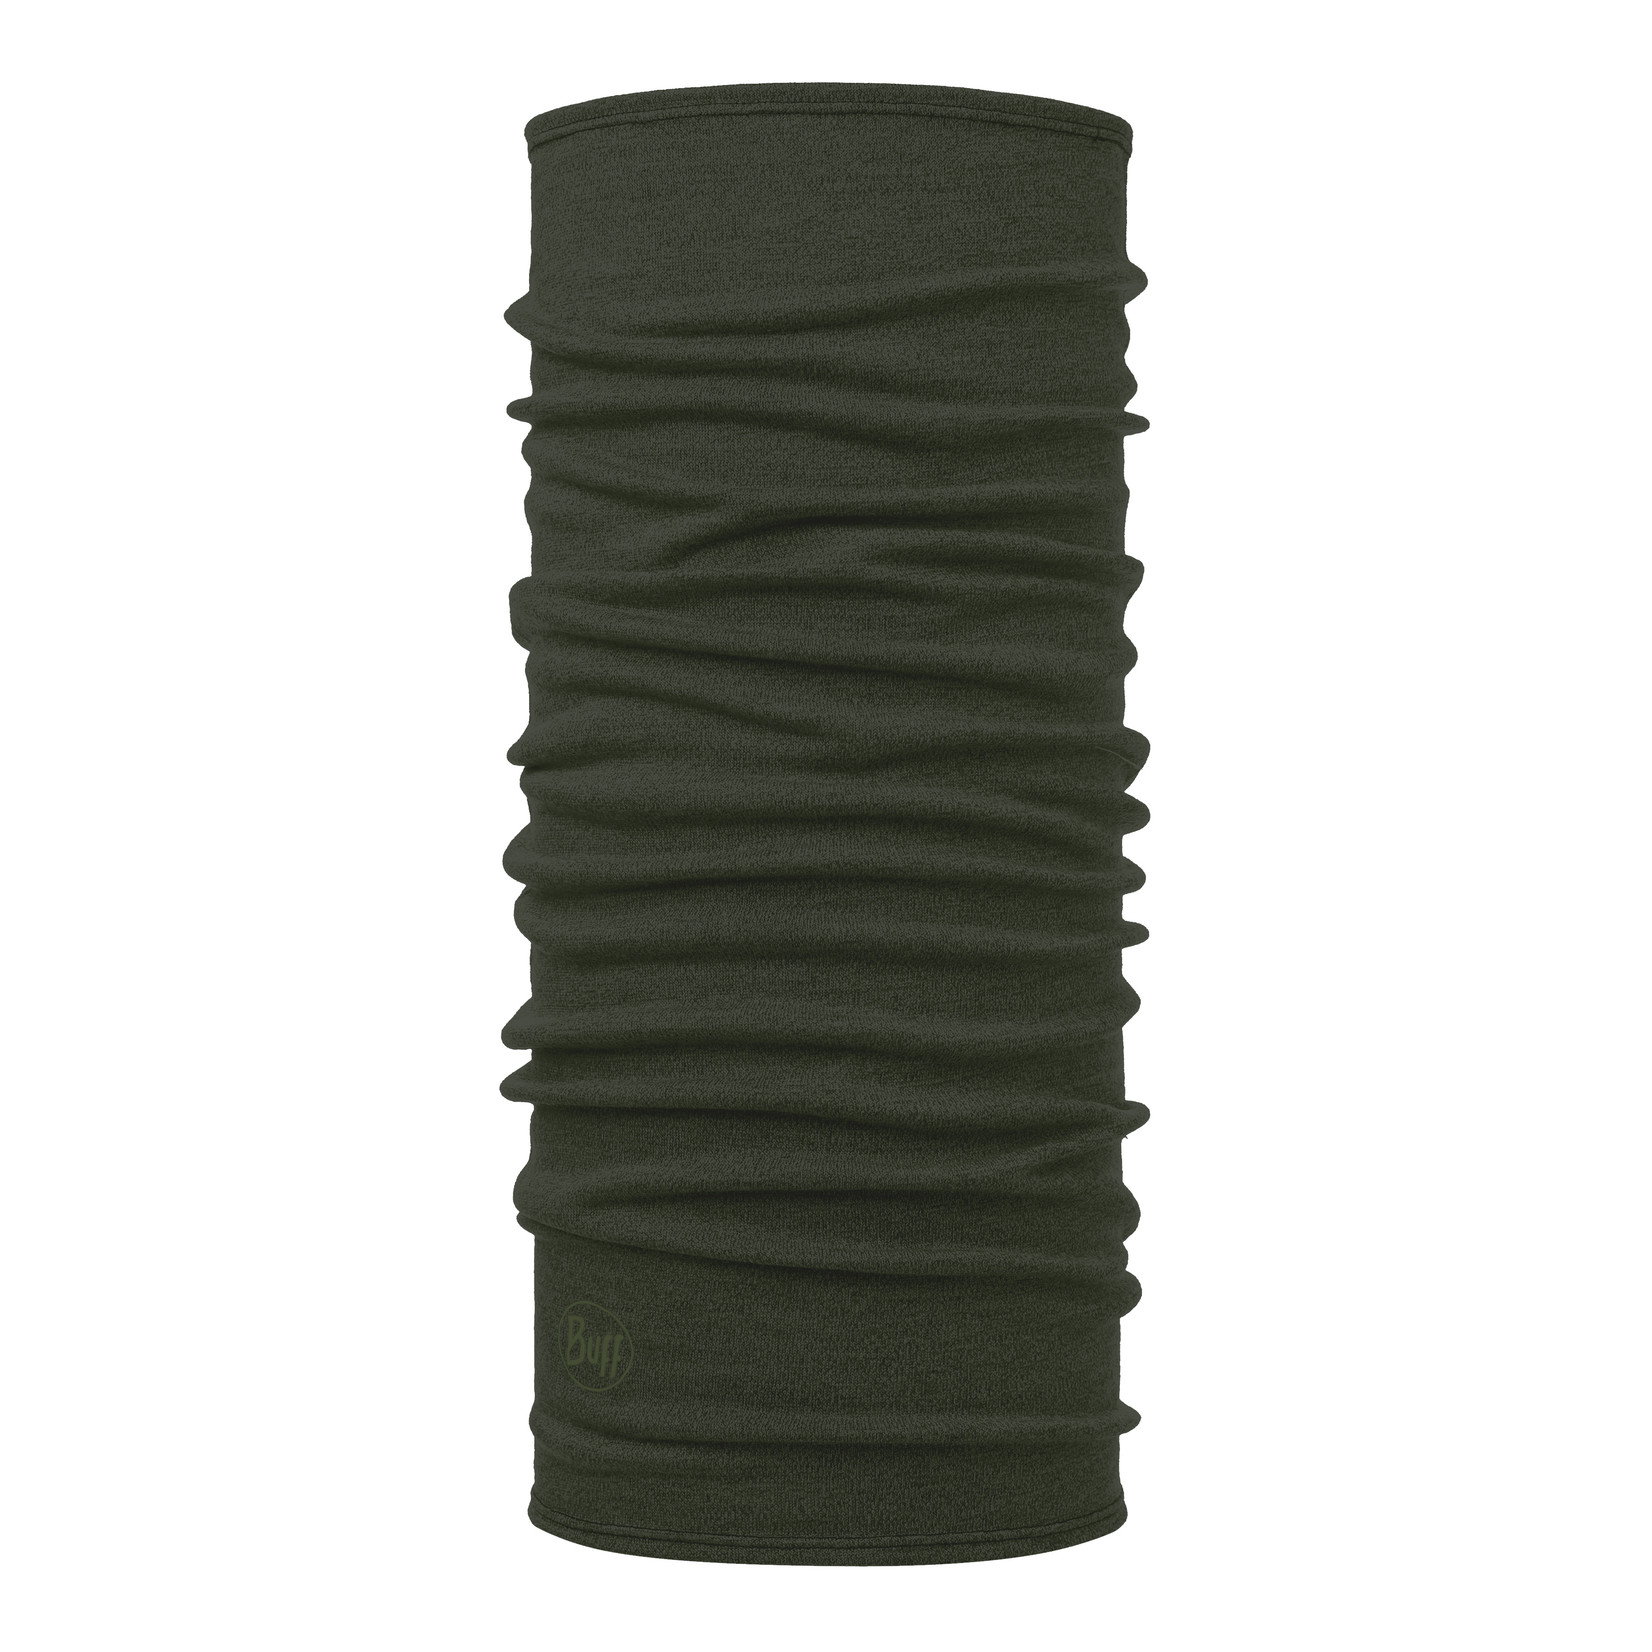 BUFF® Midweight Merino Wool